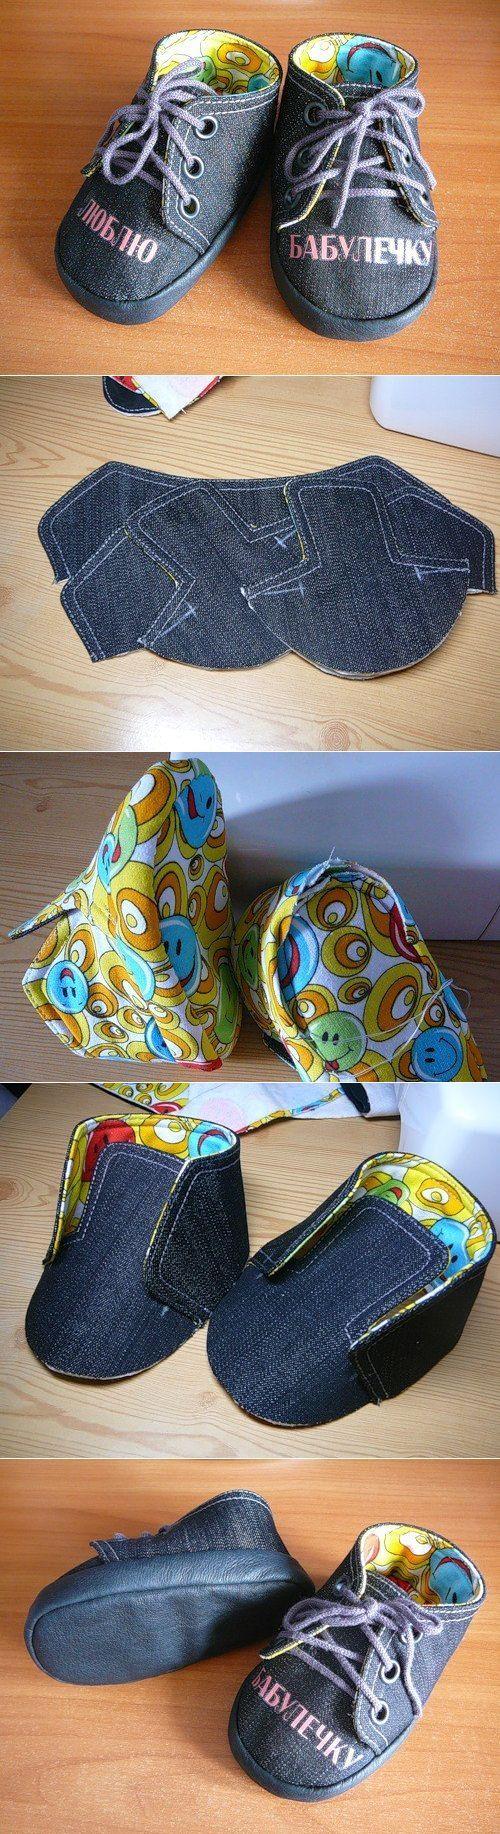 МК по пошиву детских ботиночек | На досуге -Игрушки | Постила